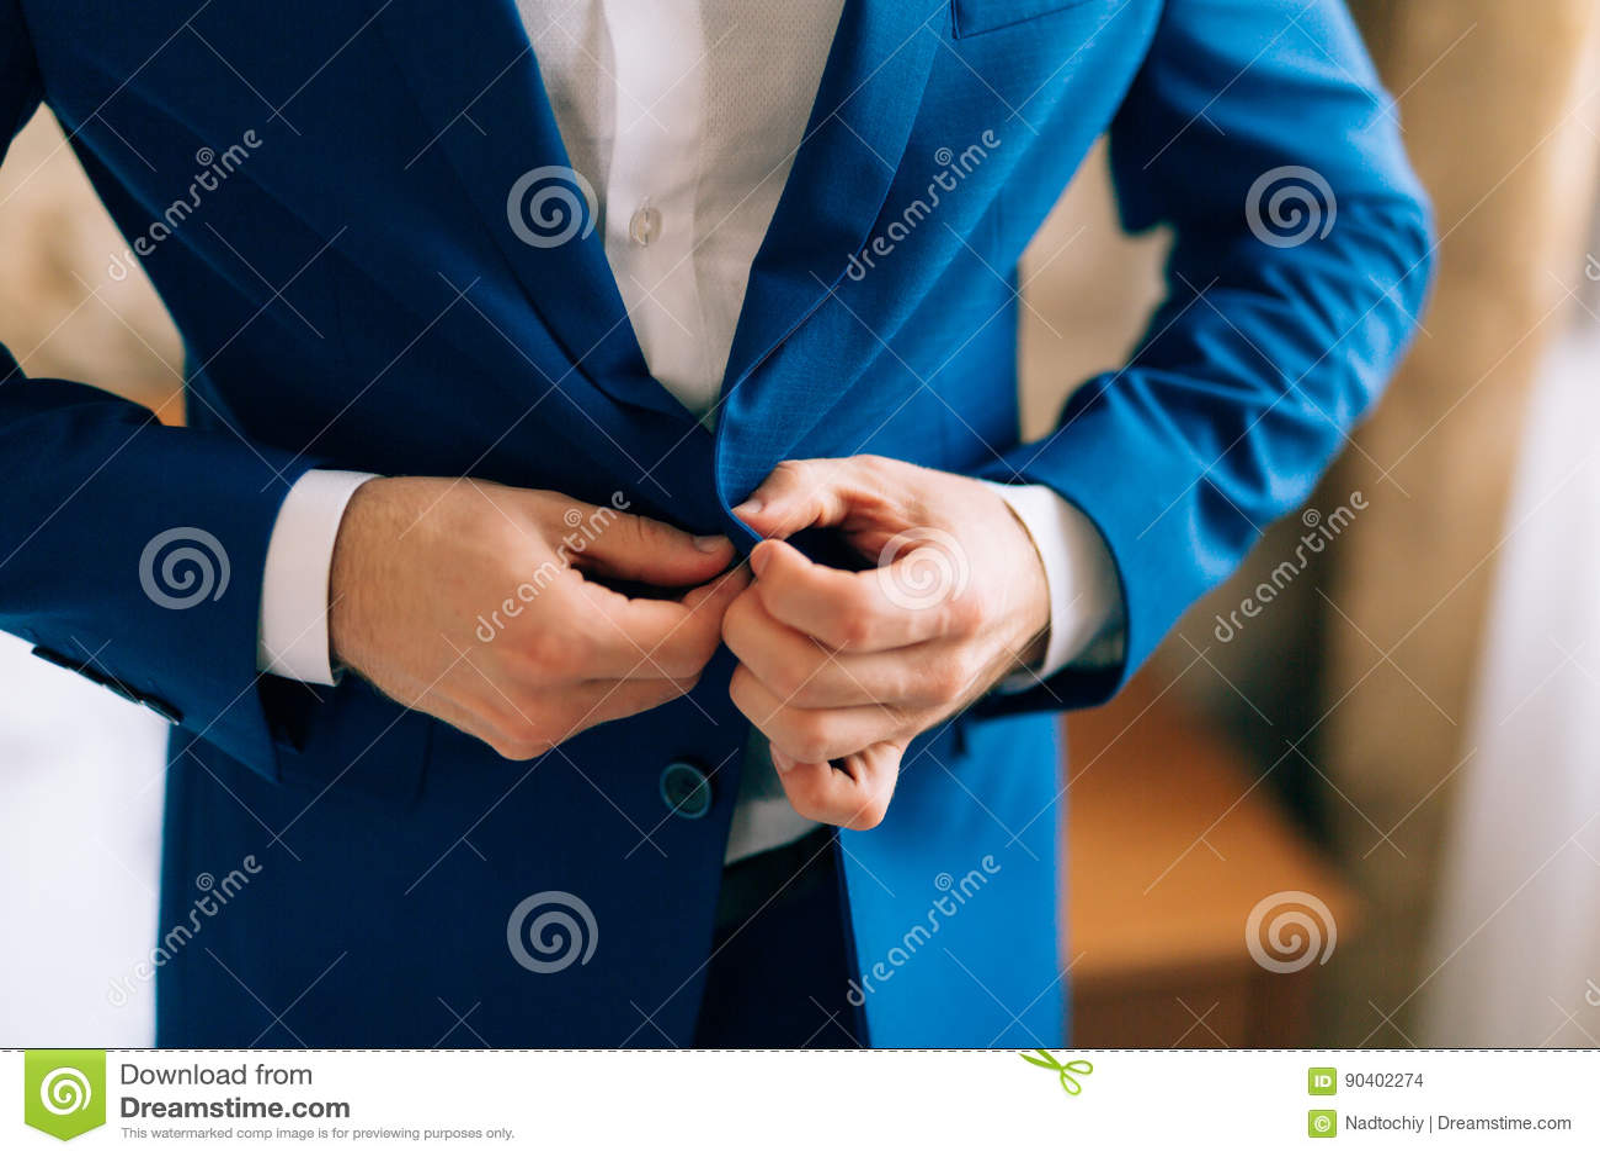 The groom zips up the jacket